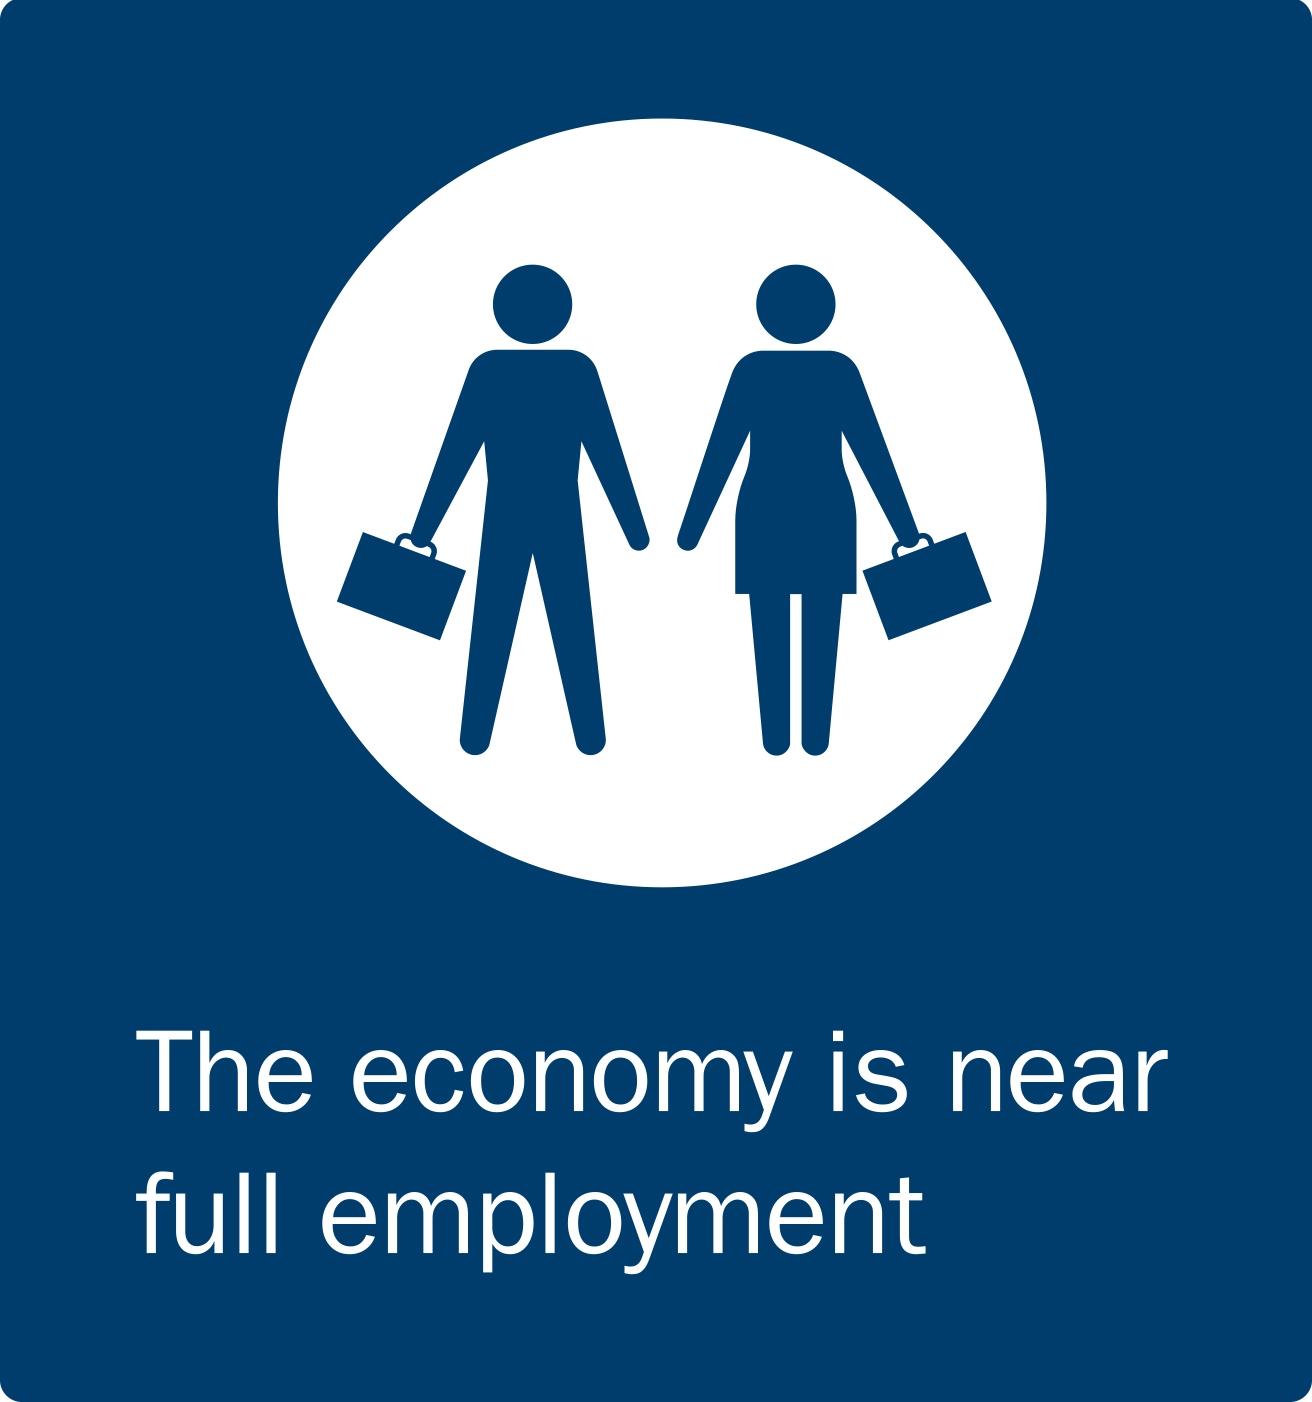 Economy is near full employment